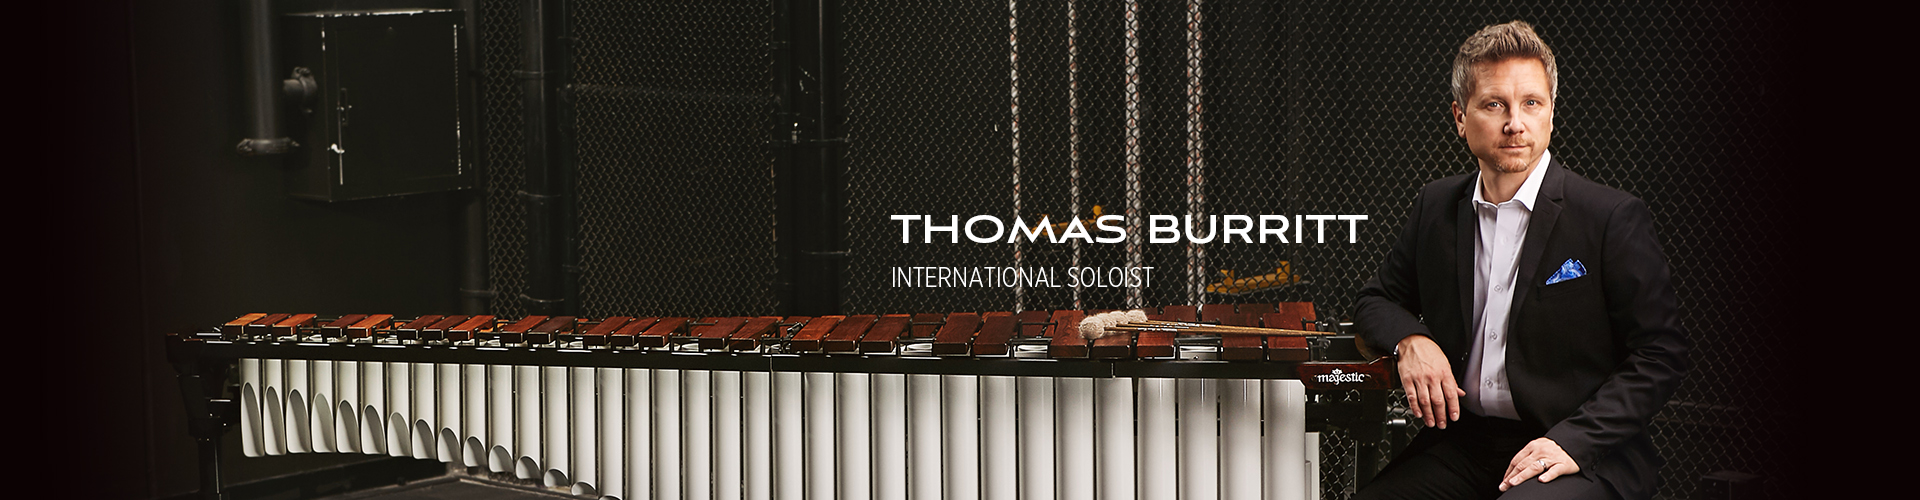 Artist Spolight- Thomas Burritt